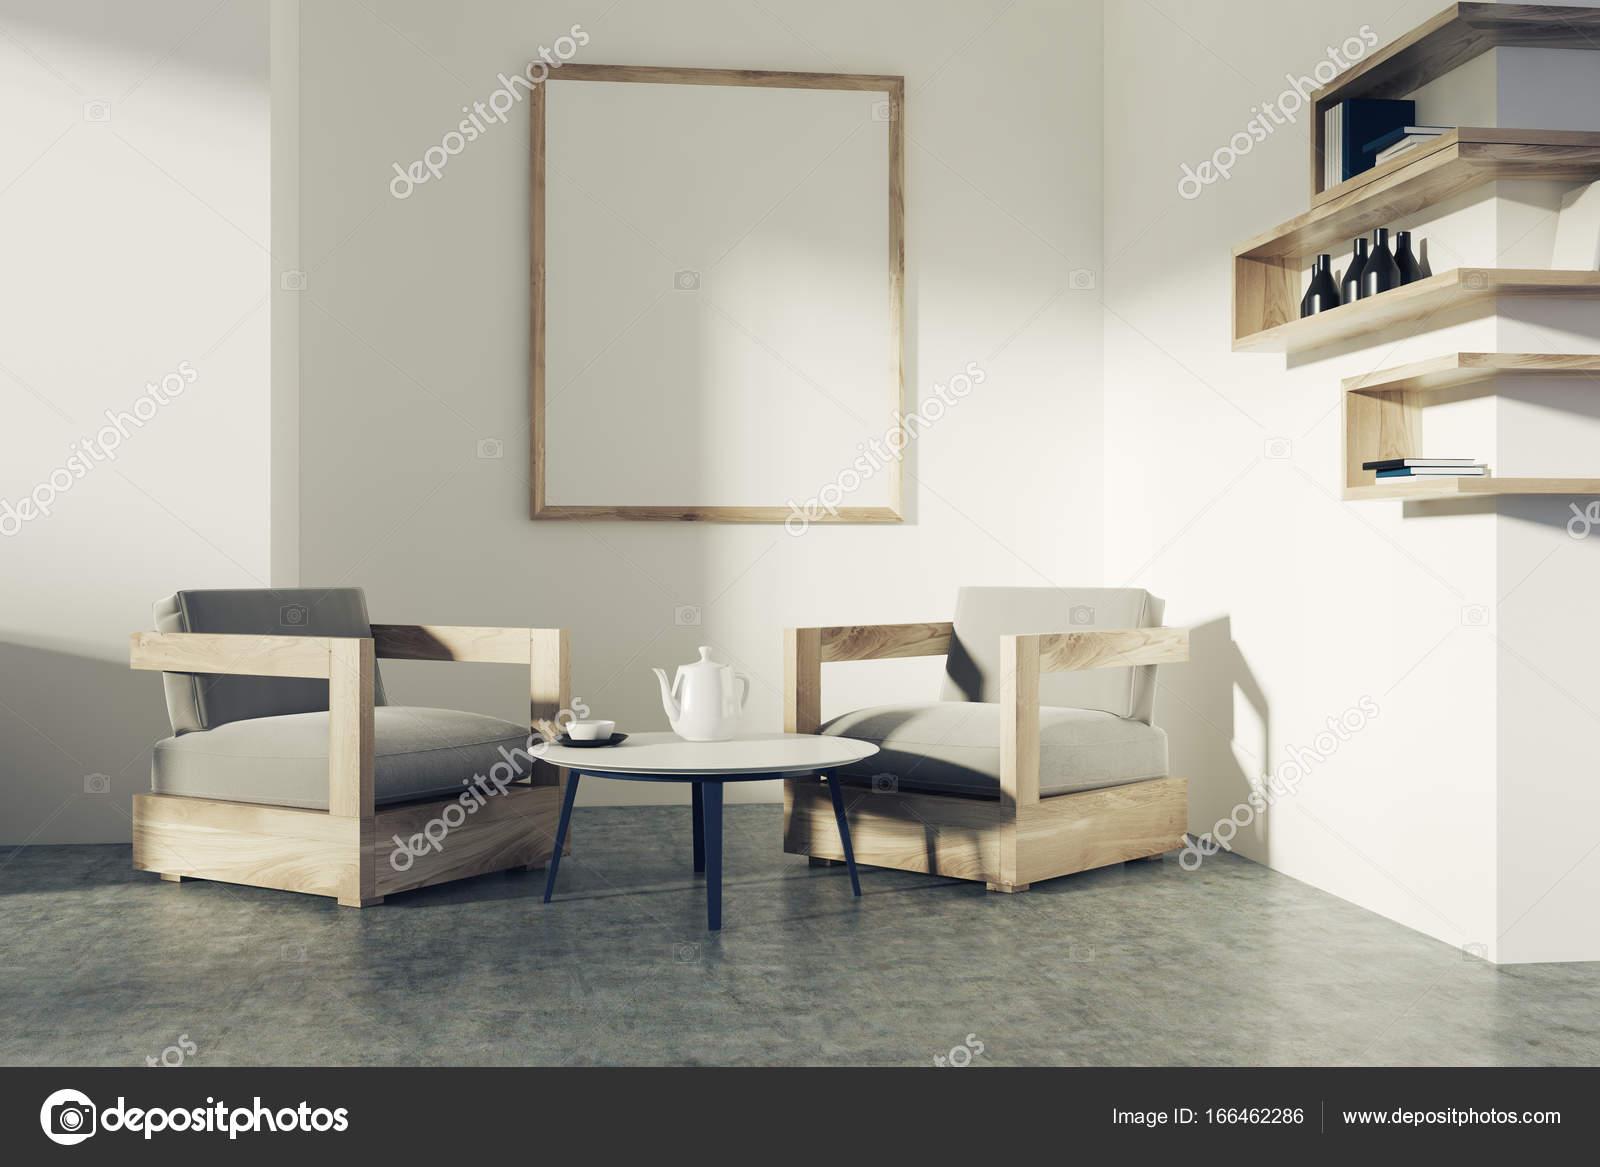 https://st3.depositphotos.com/2673929/16646/i/1600/depositphotos_166462286-stockafbeelding-wit-woonkamer-fauteuils-poster.jpg